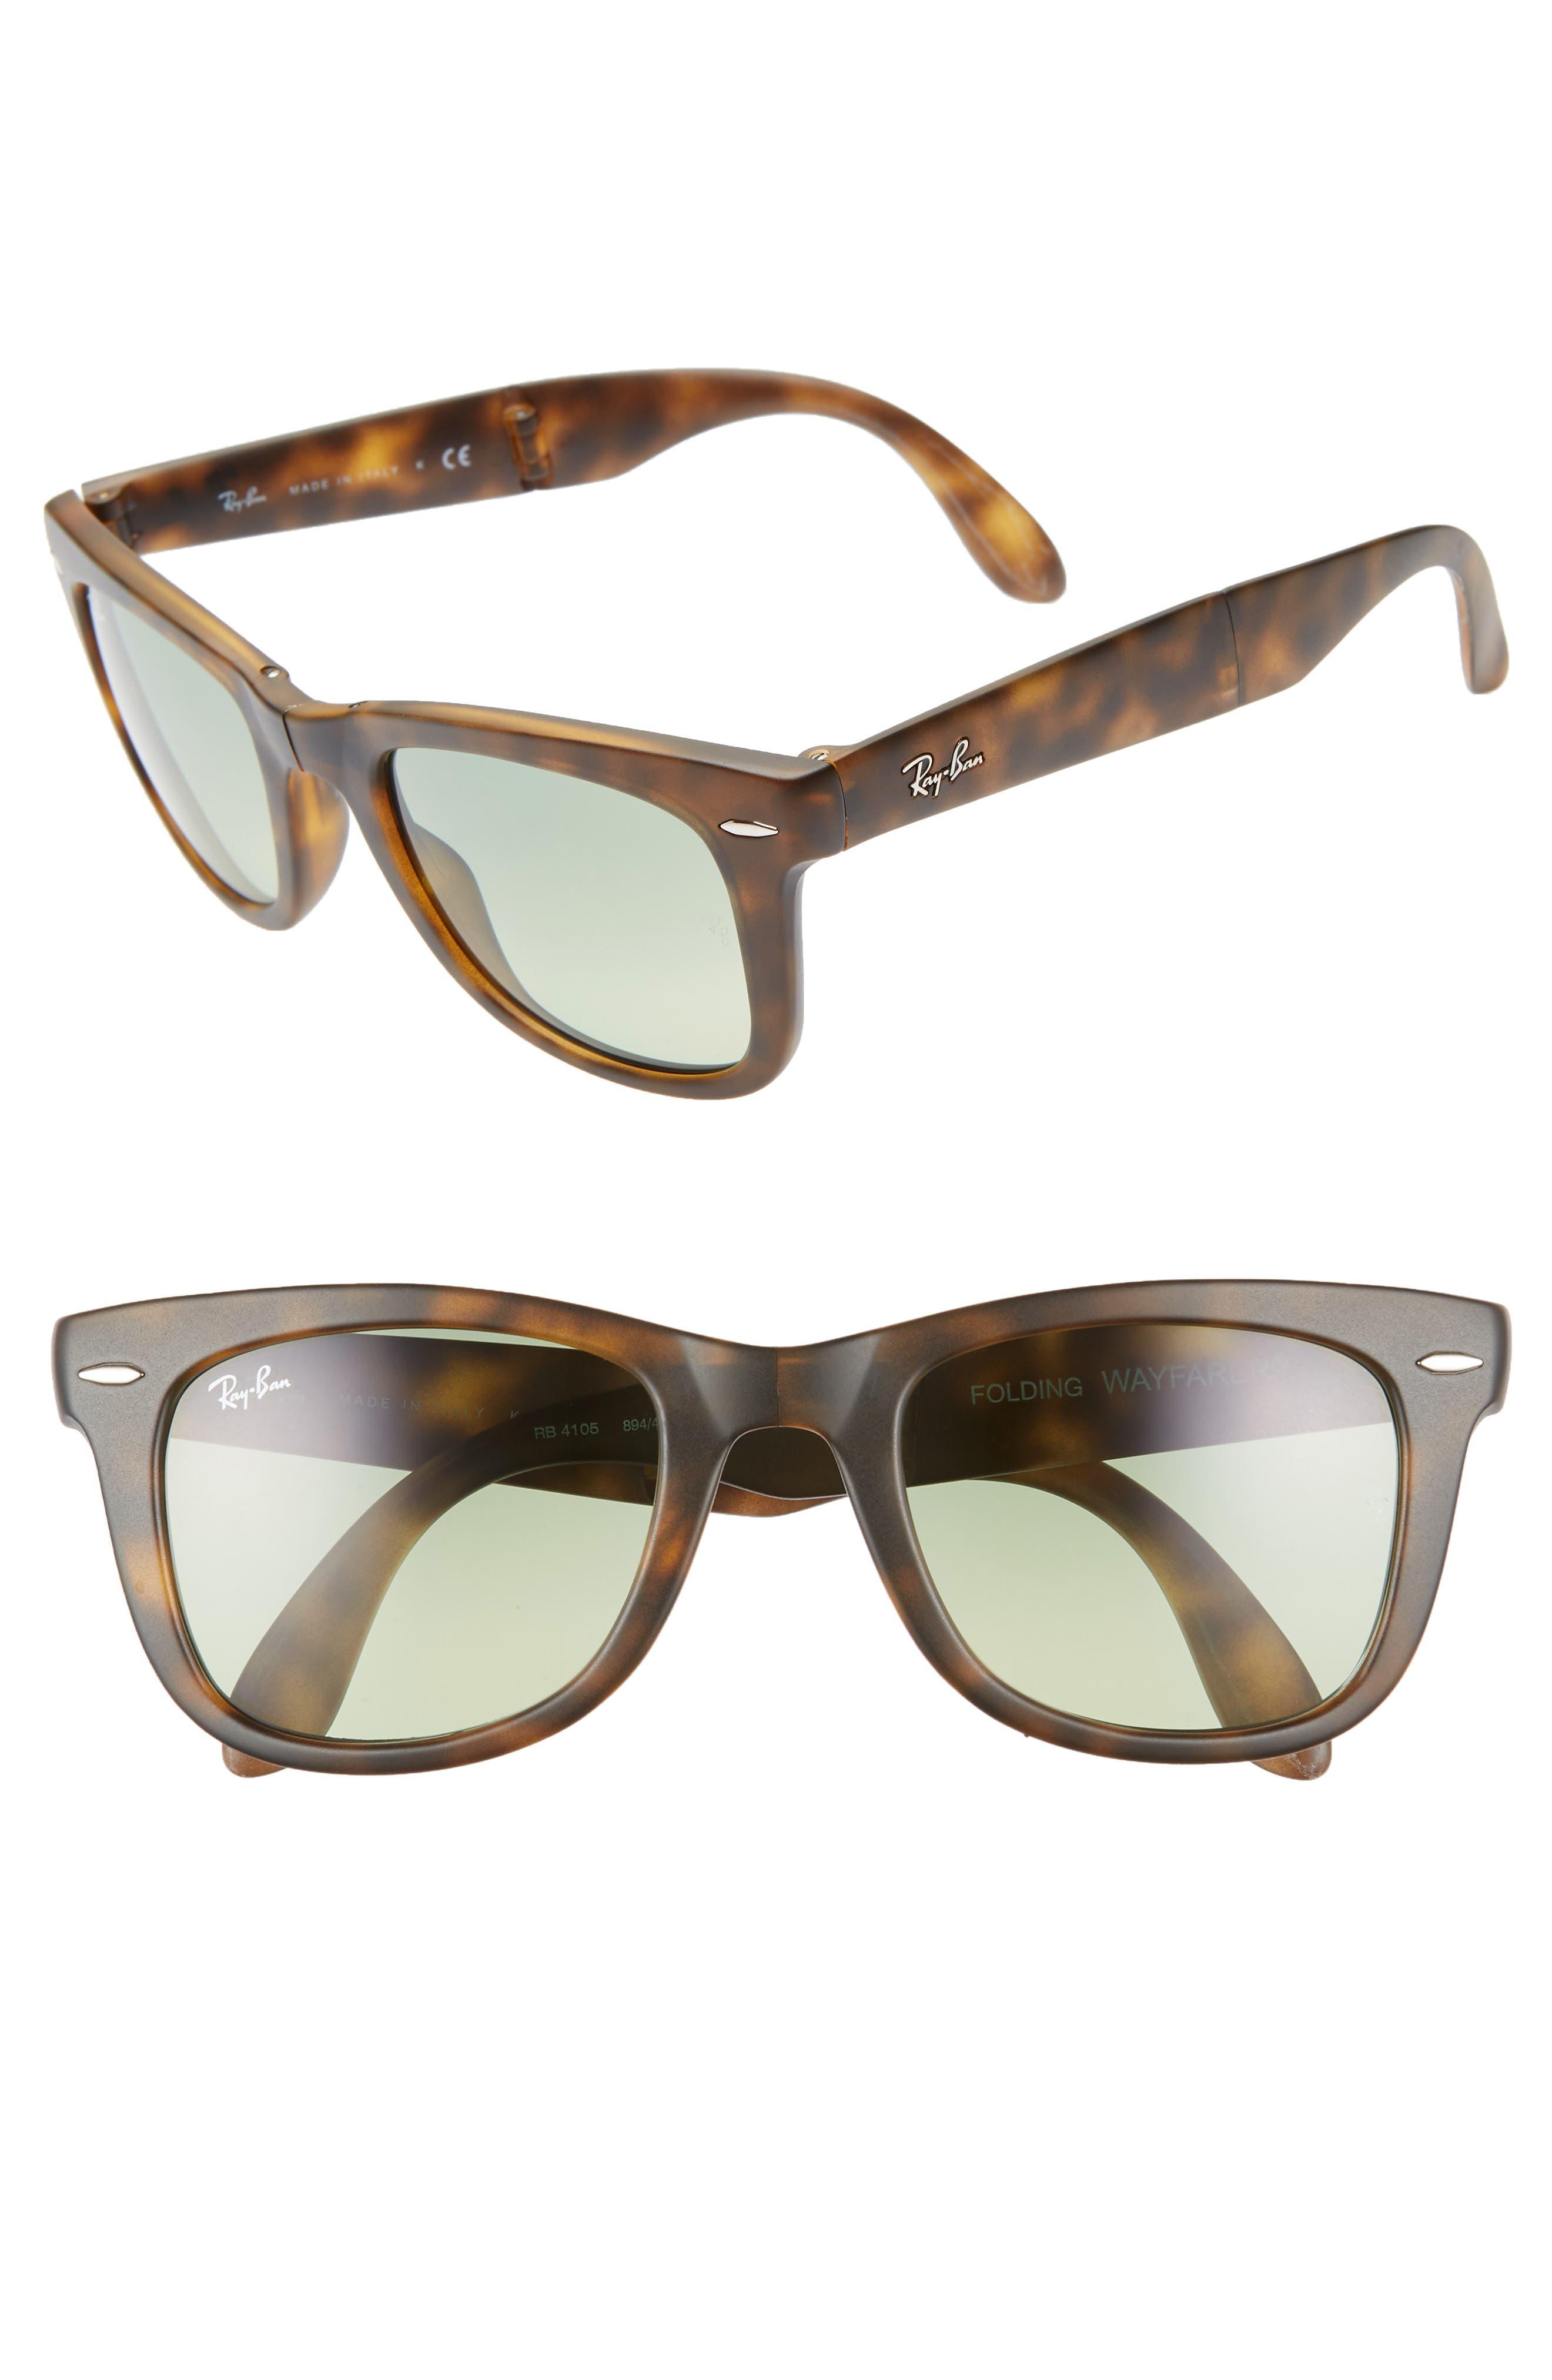 Ray-Ban  Folding Wayfarer  50Mm Sunglasses - Green Havana 81ade84a473b